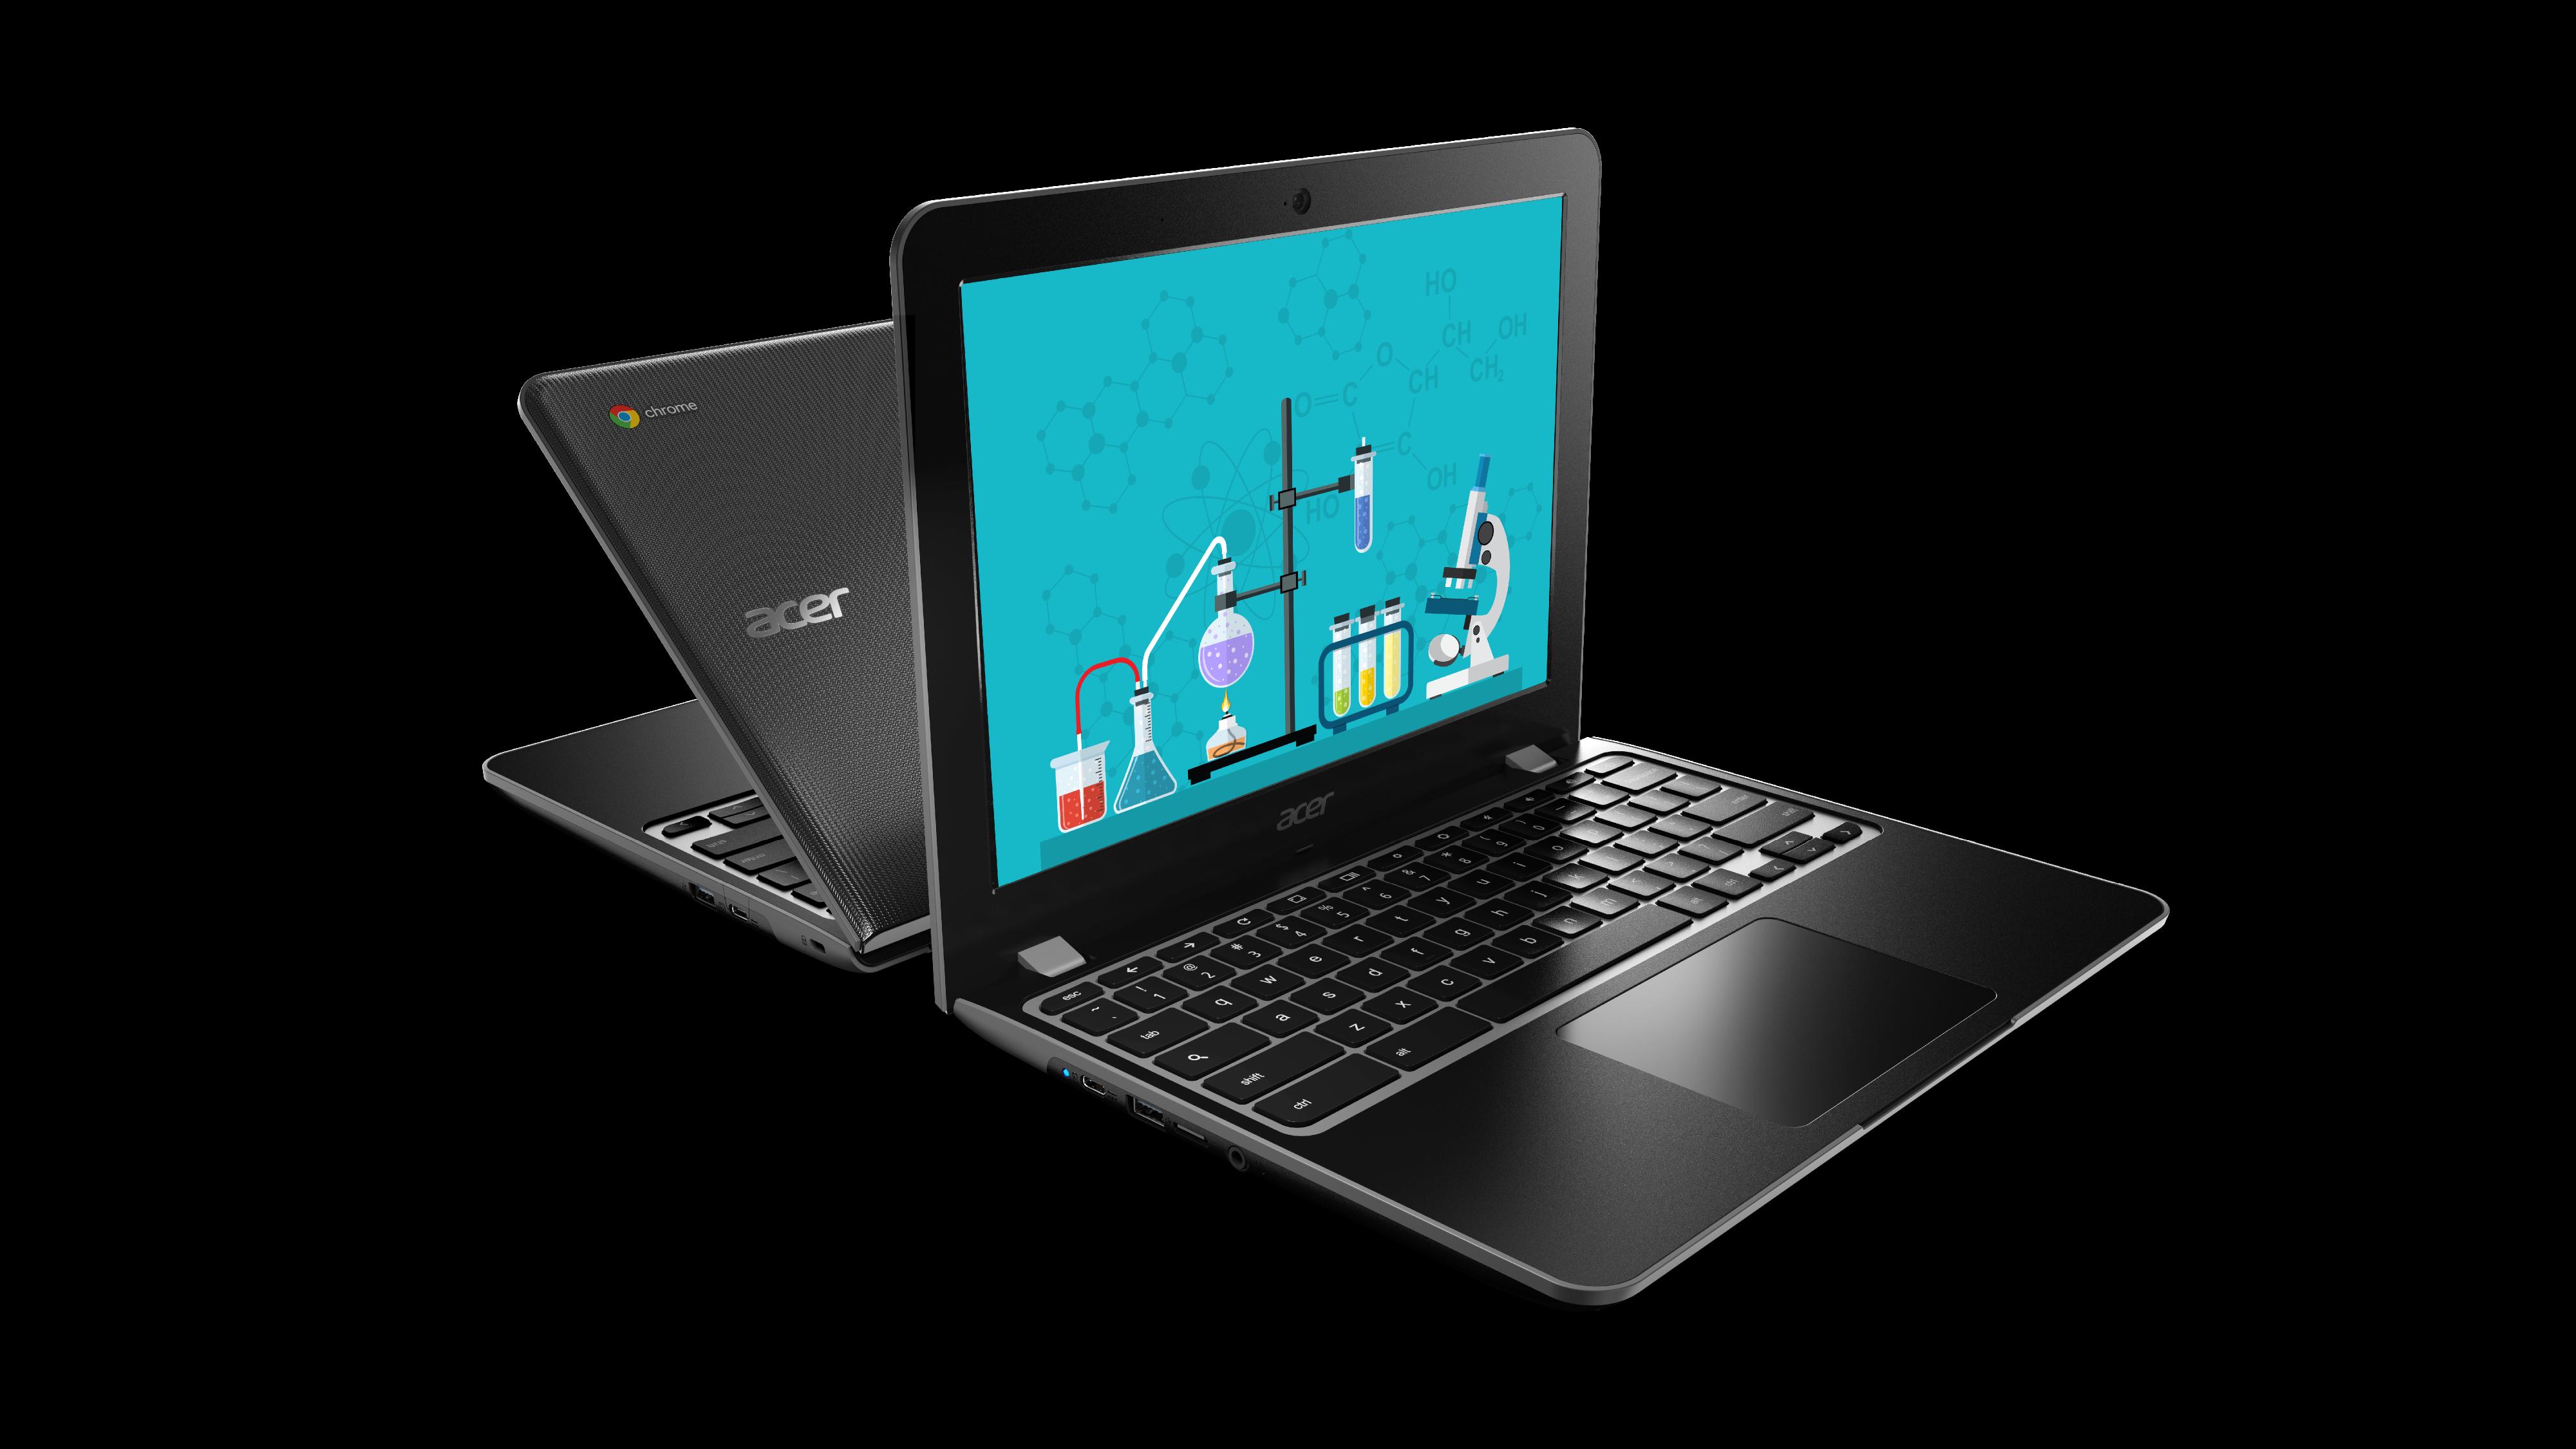 Chromebook - The Verge